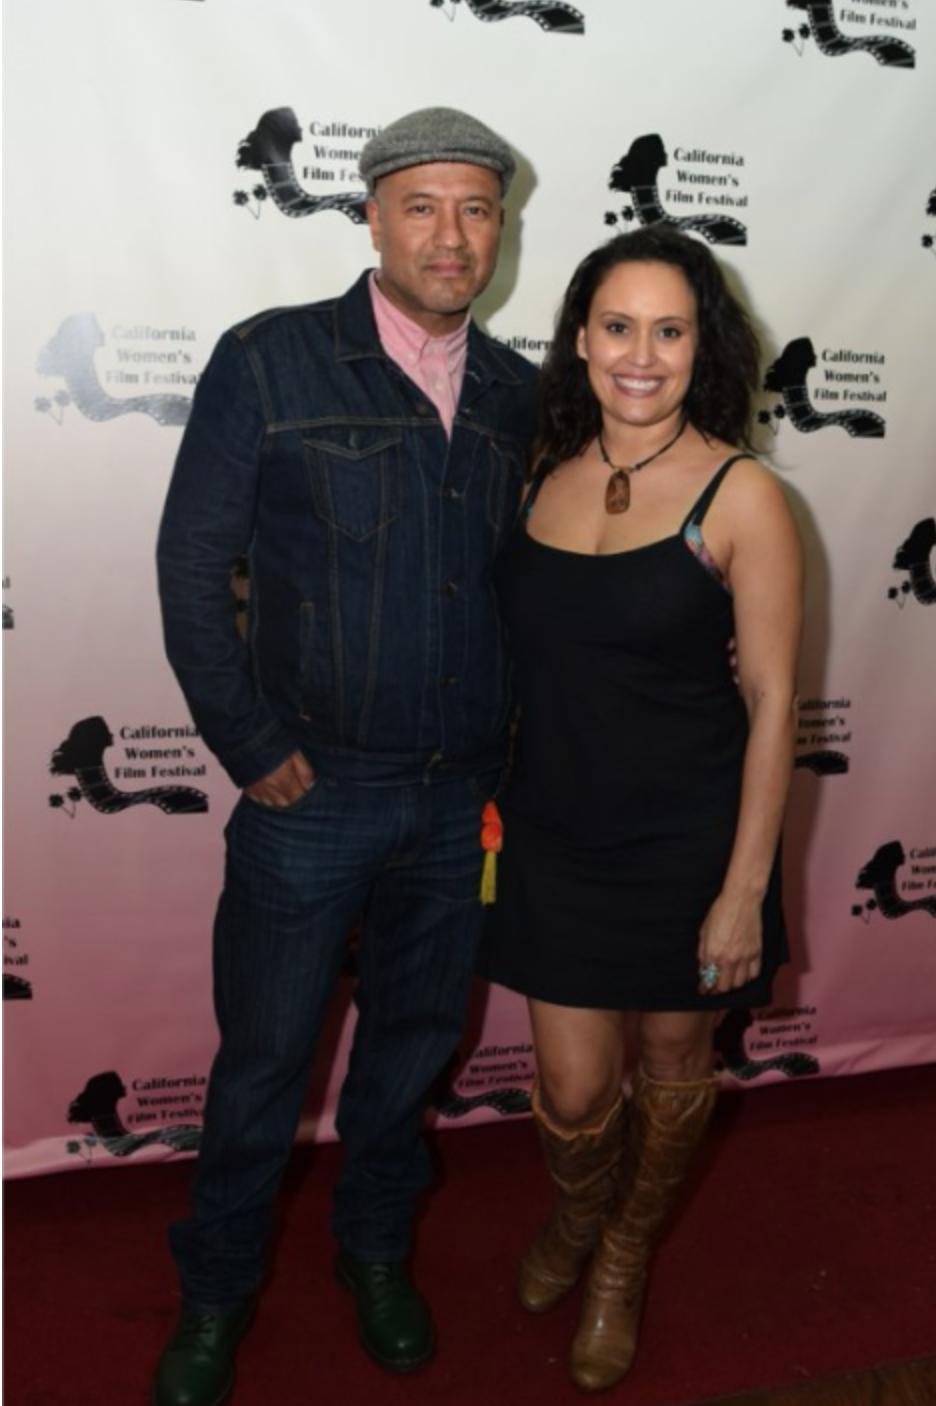 Juan Escobedo and Toni Torres